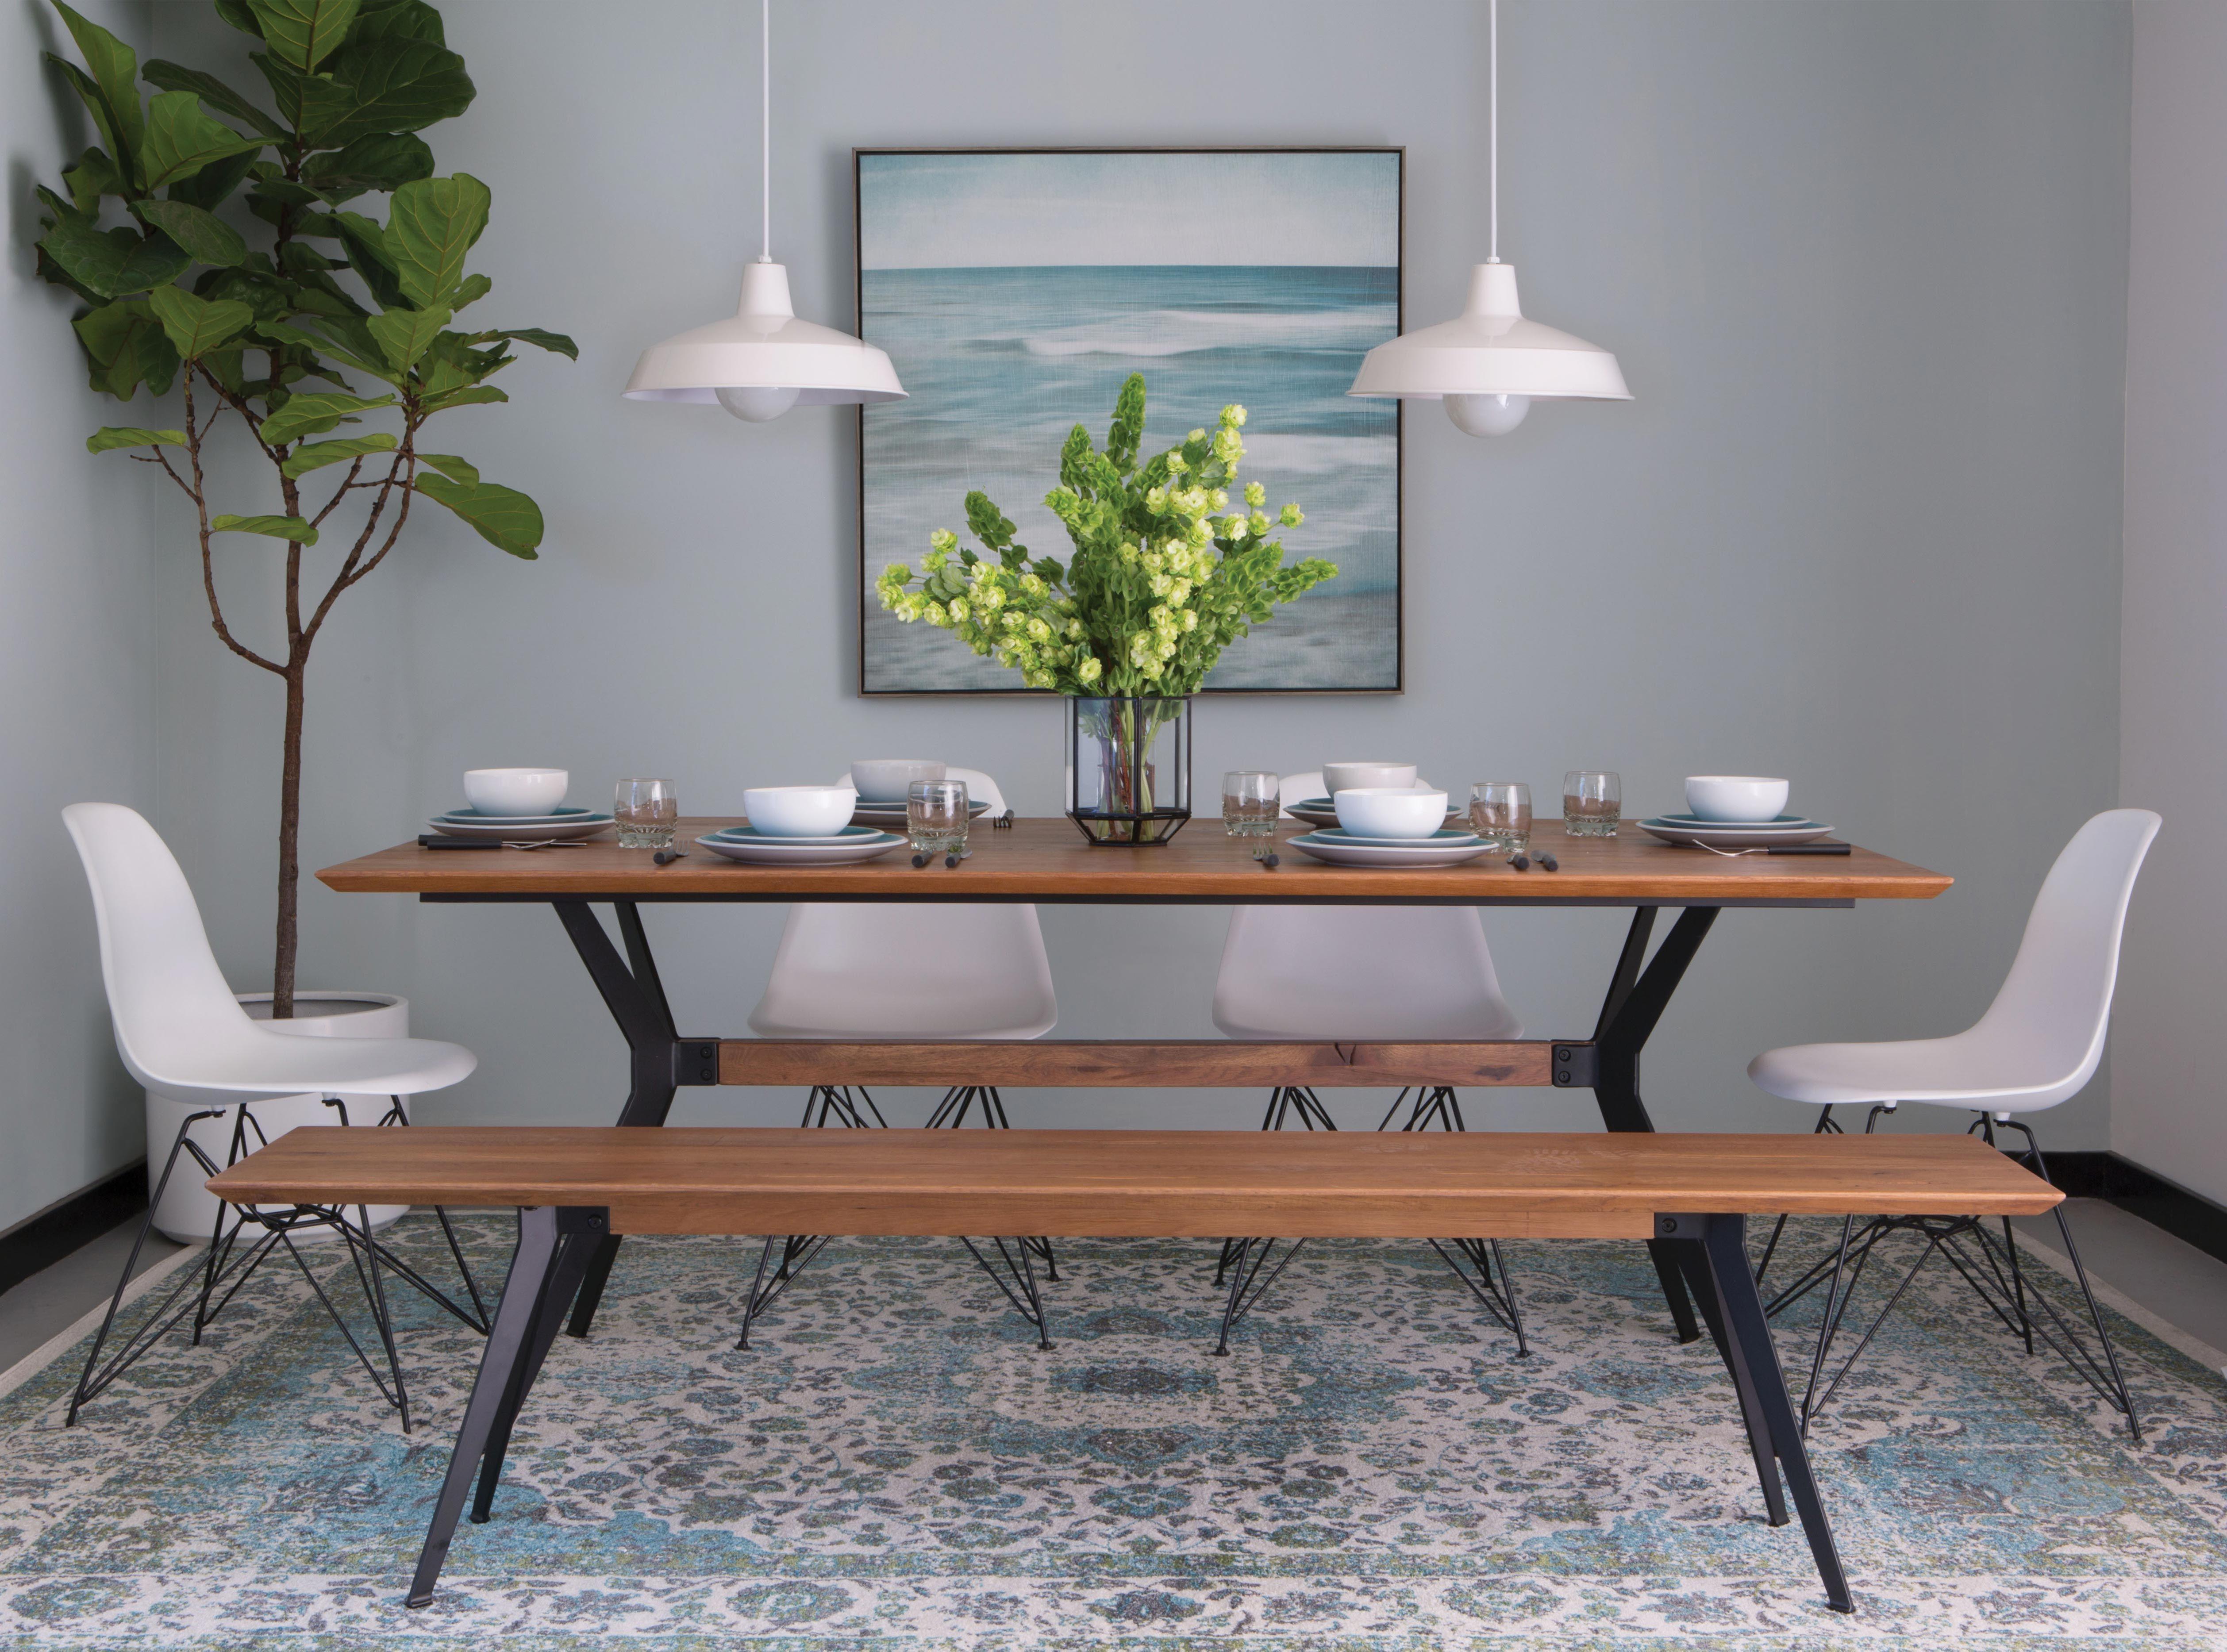 Dinner is served. #BonAppetit #LivingSpaces | Dining Room ...